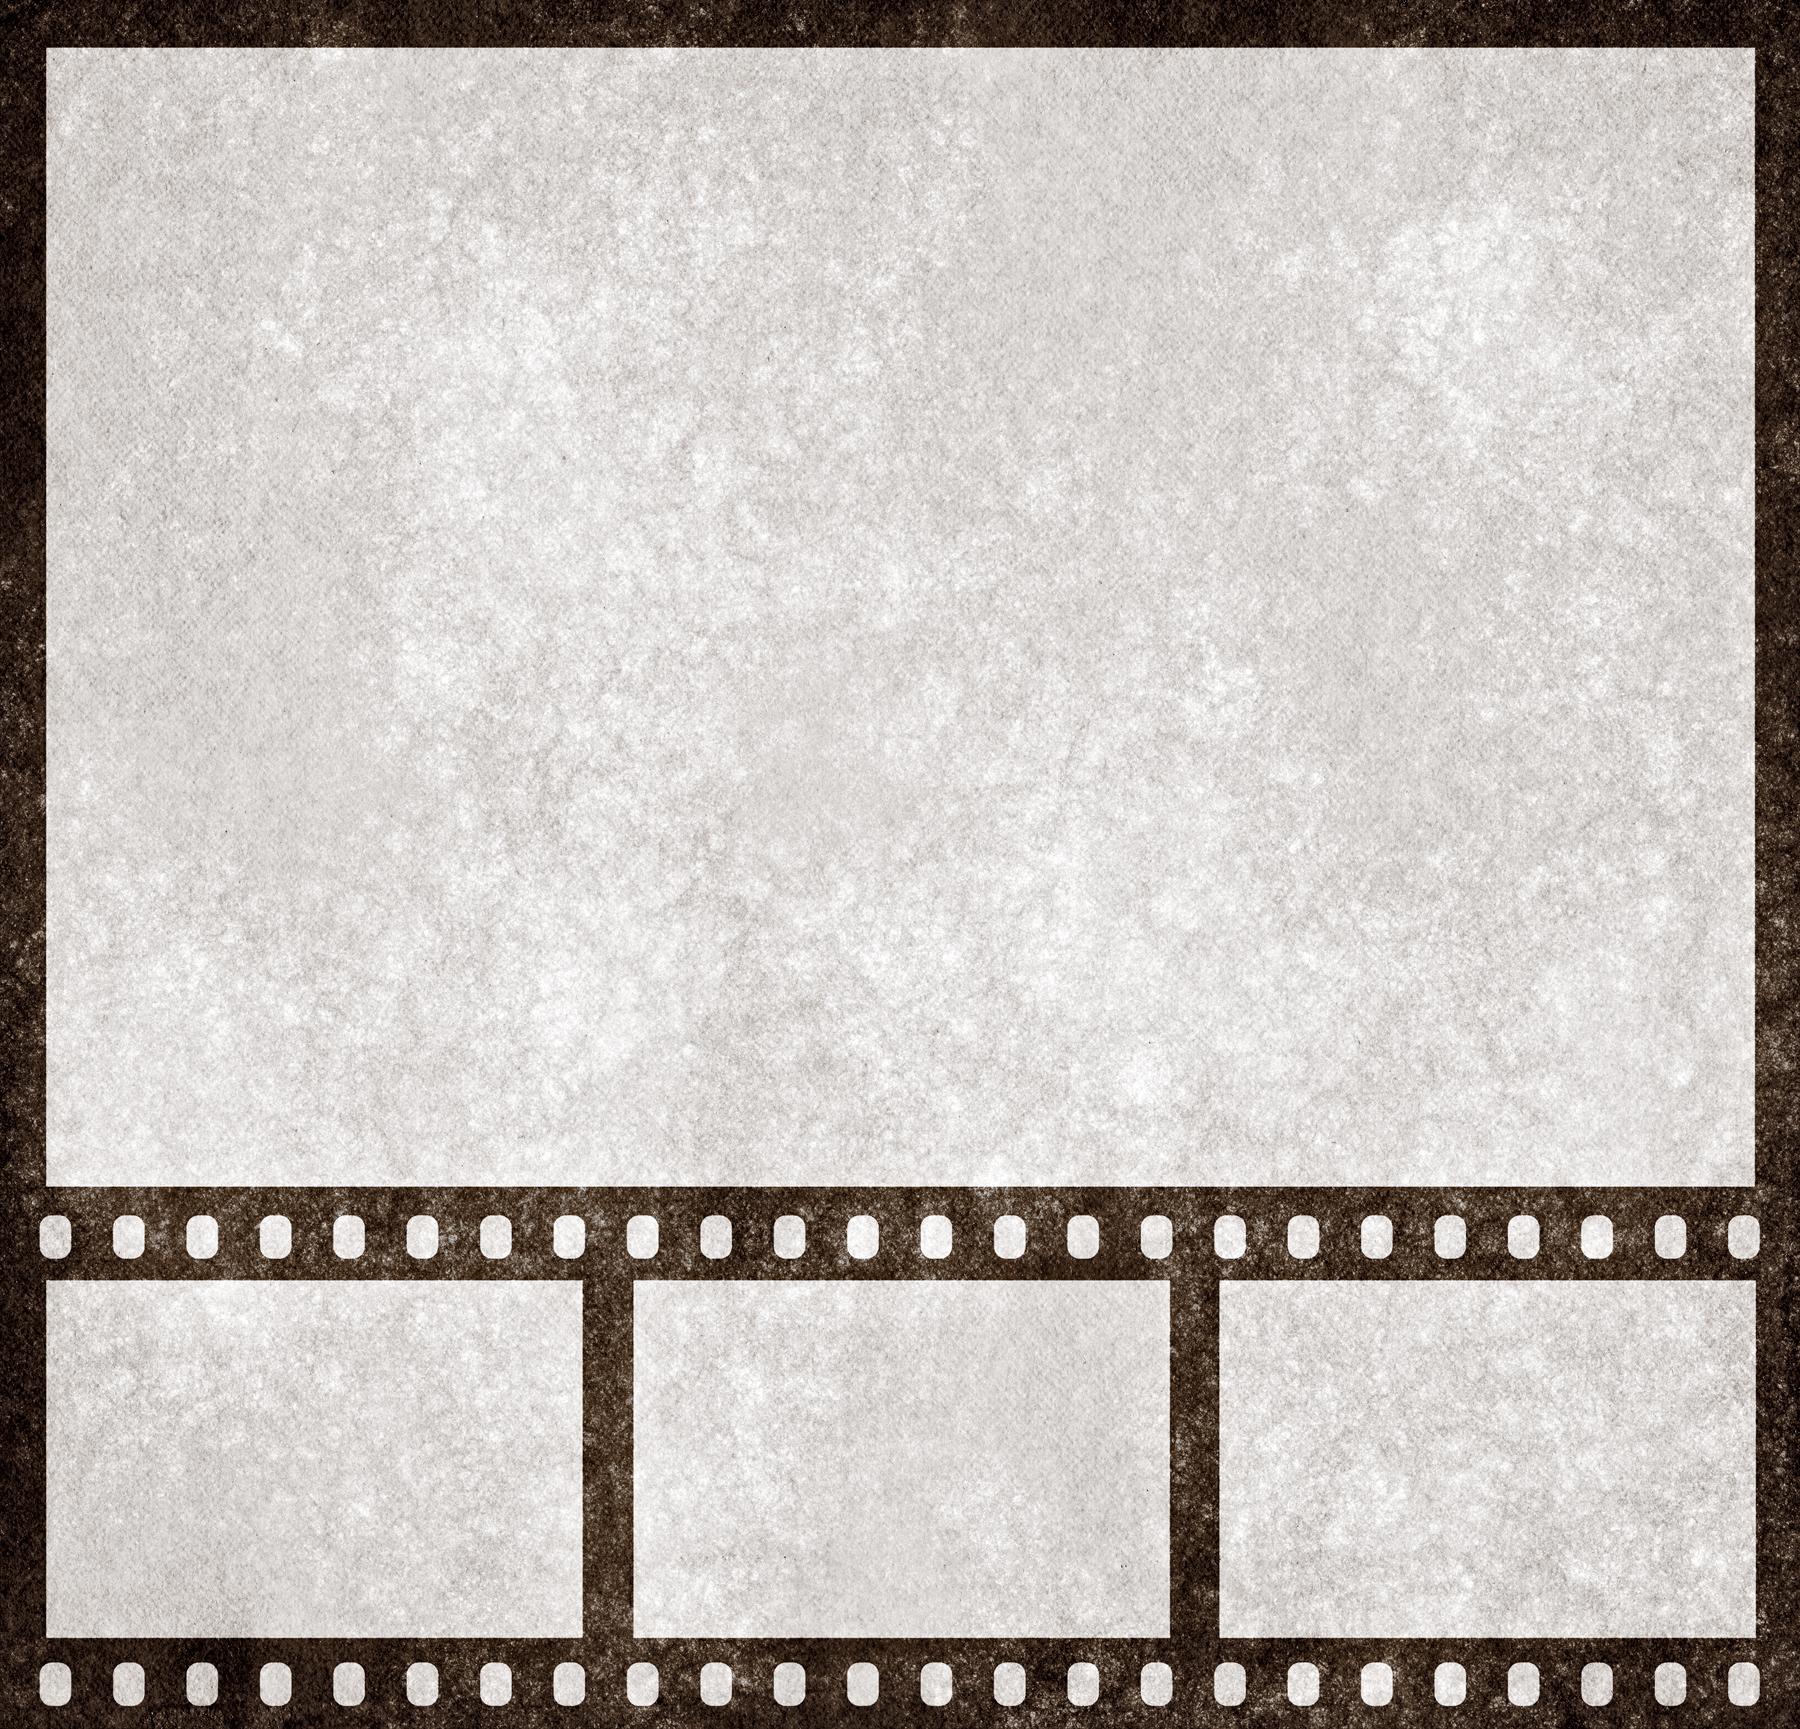 Film Strip Grunge, Sheet, Old, Page, Paper, HQ Photo